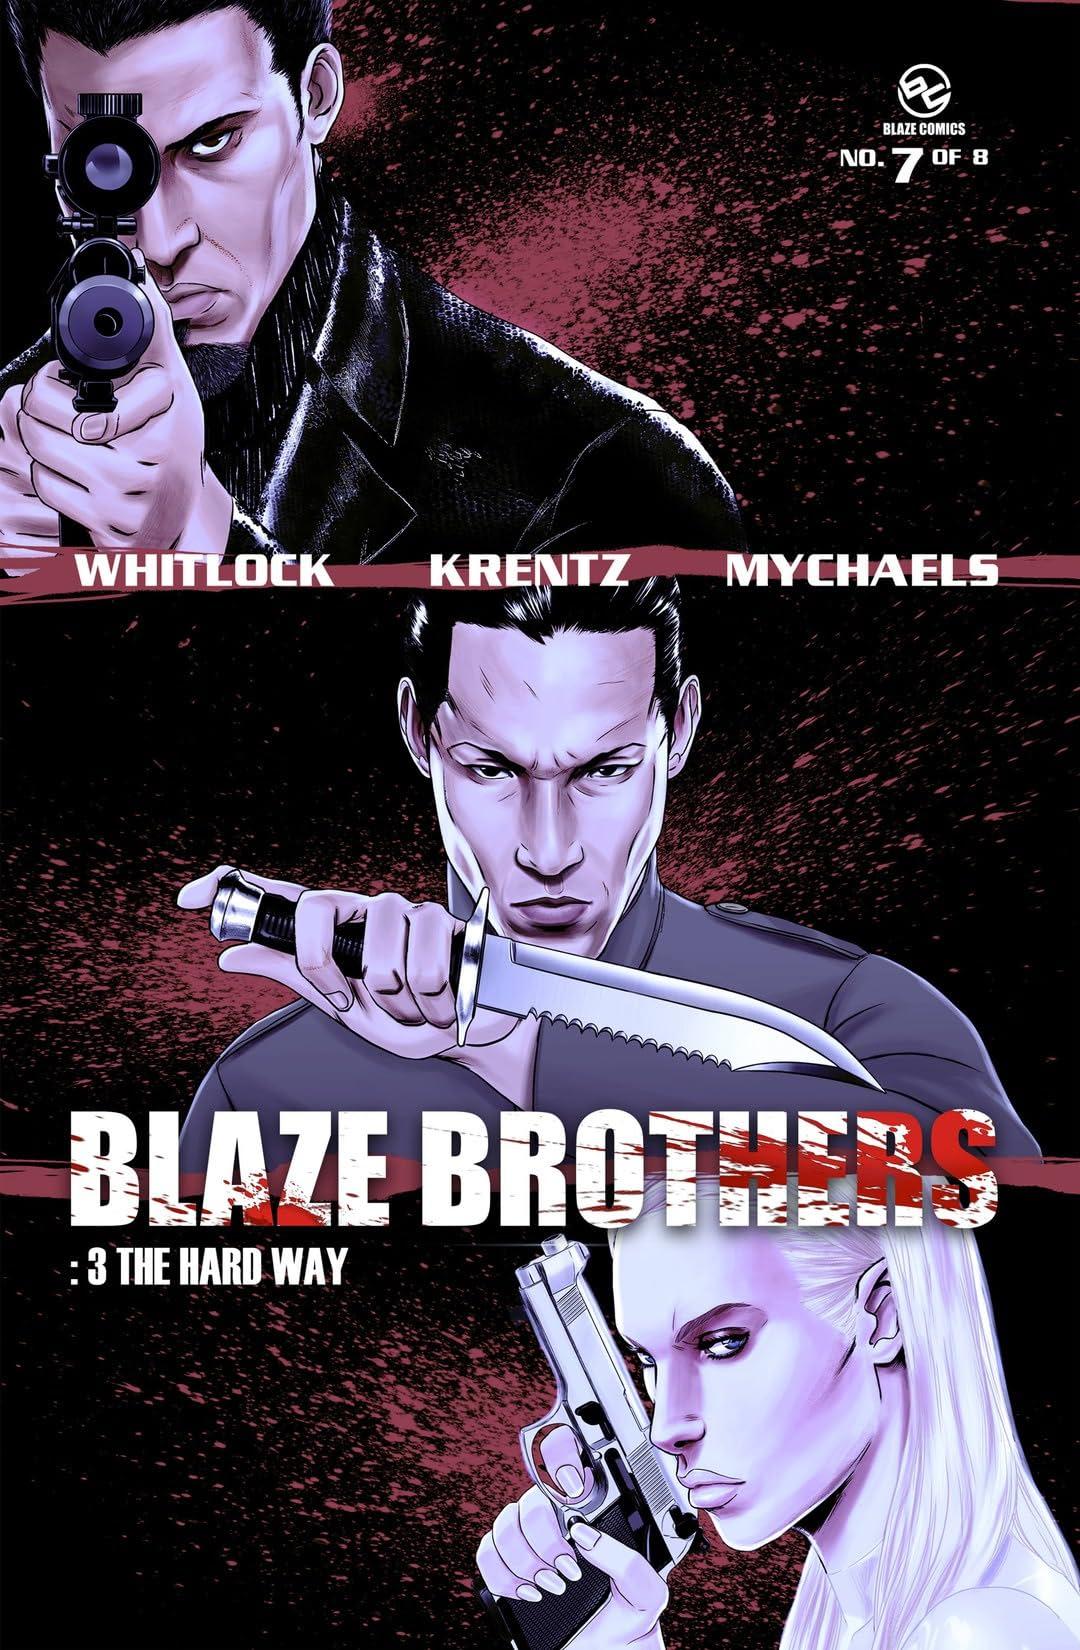 Blaze Brothers #7